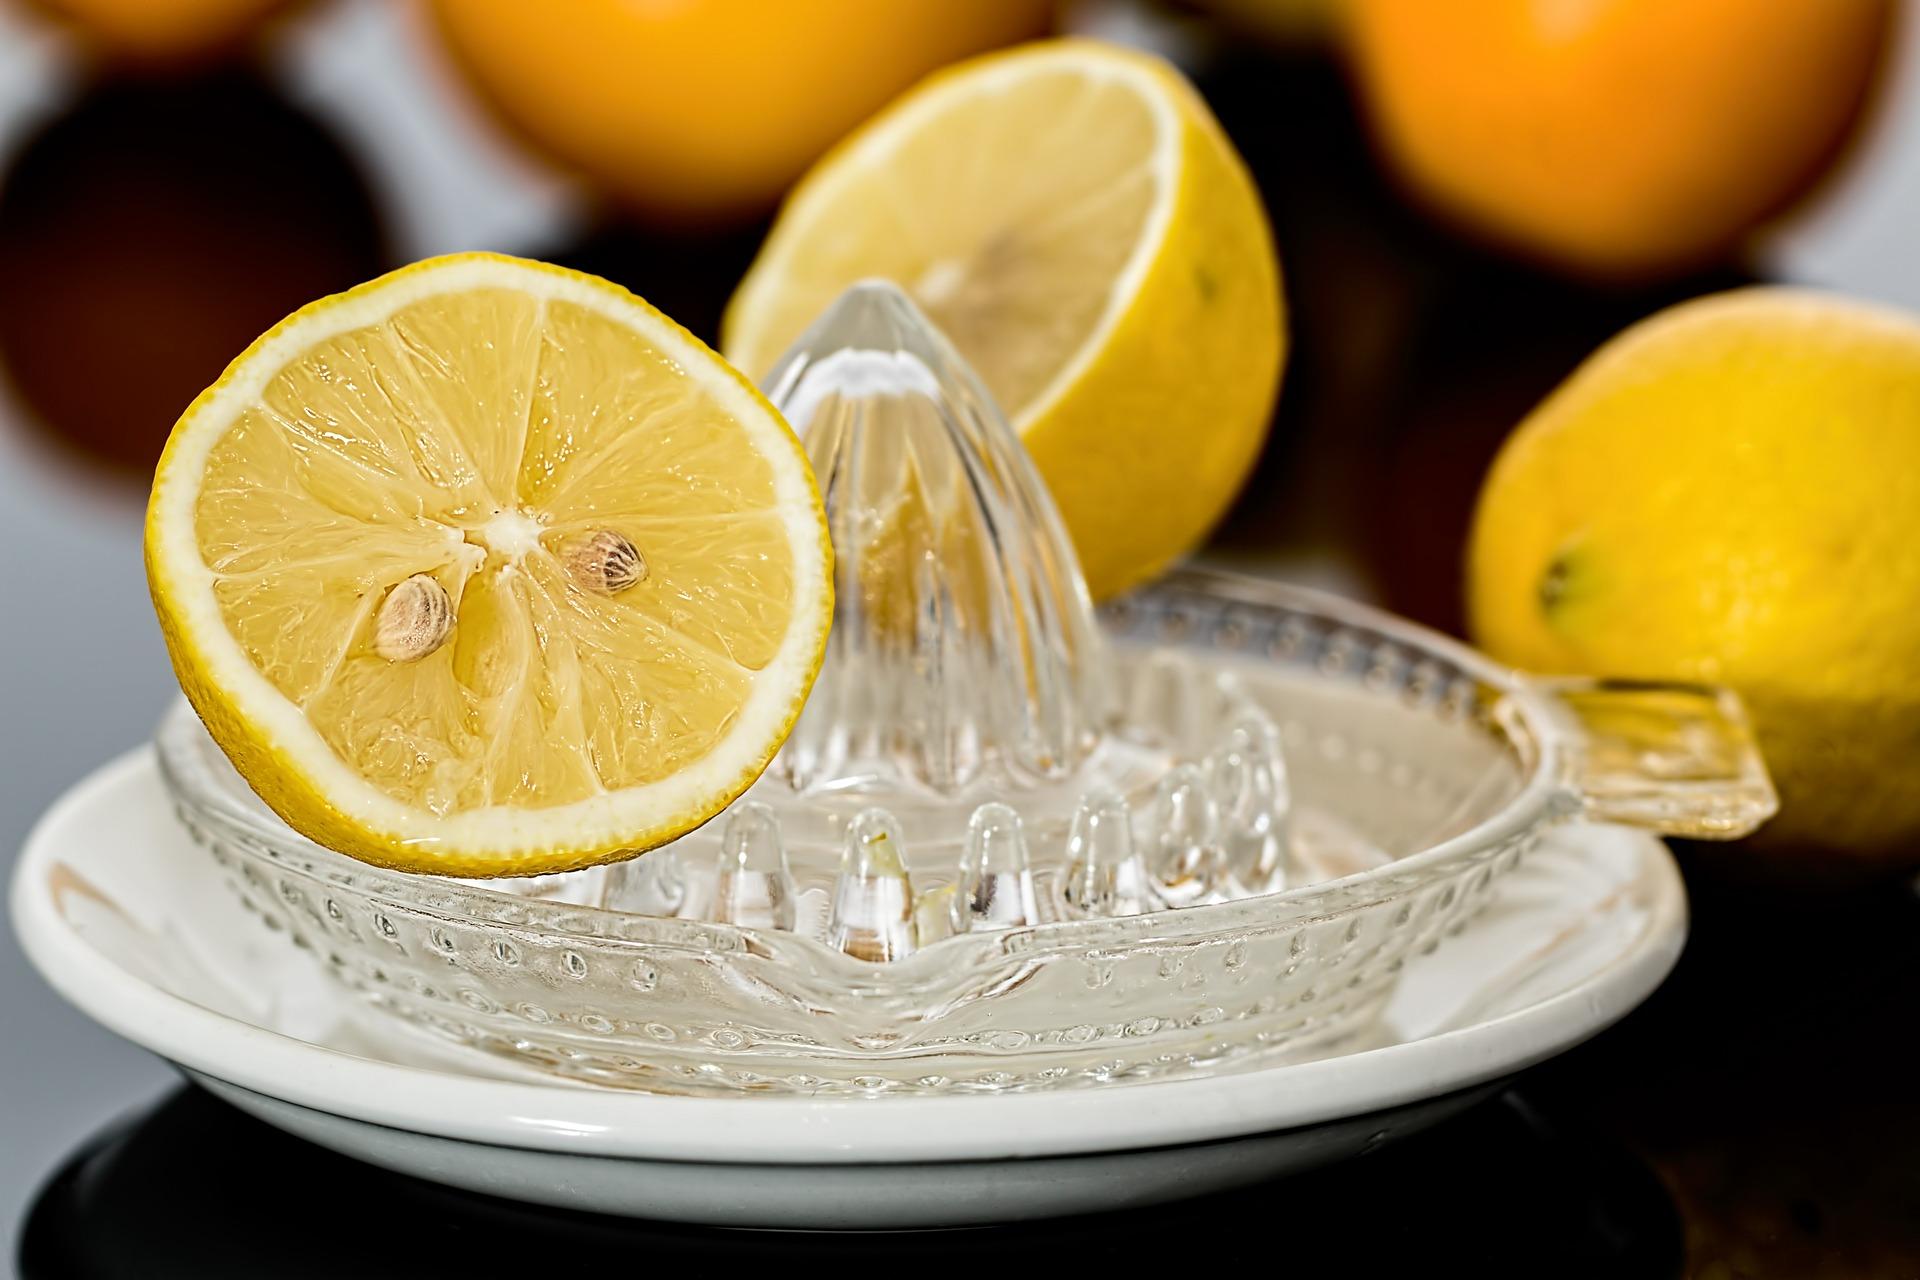 bebida isotónica casera de limón